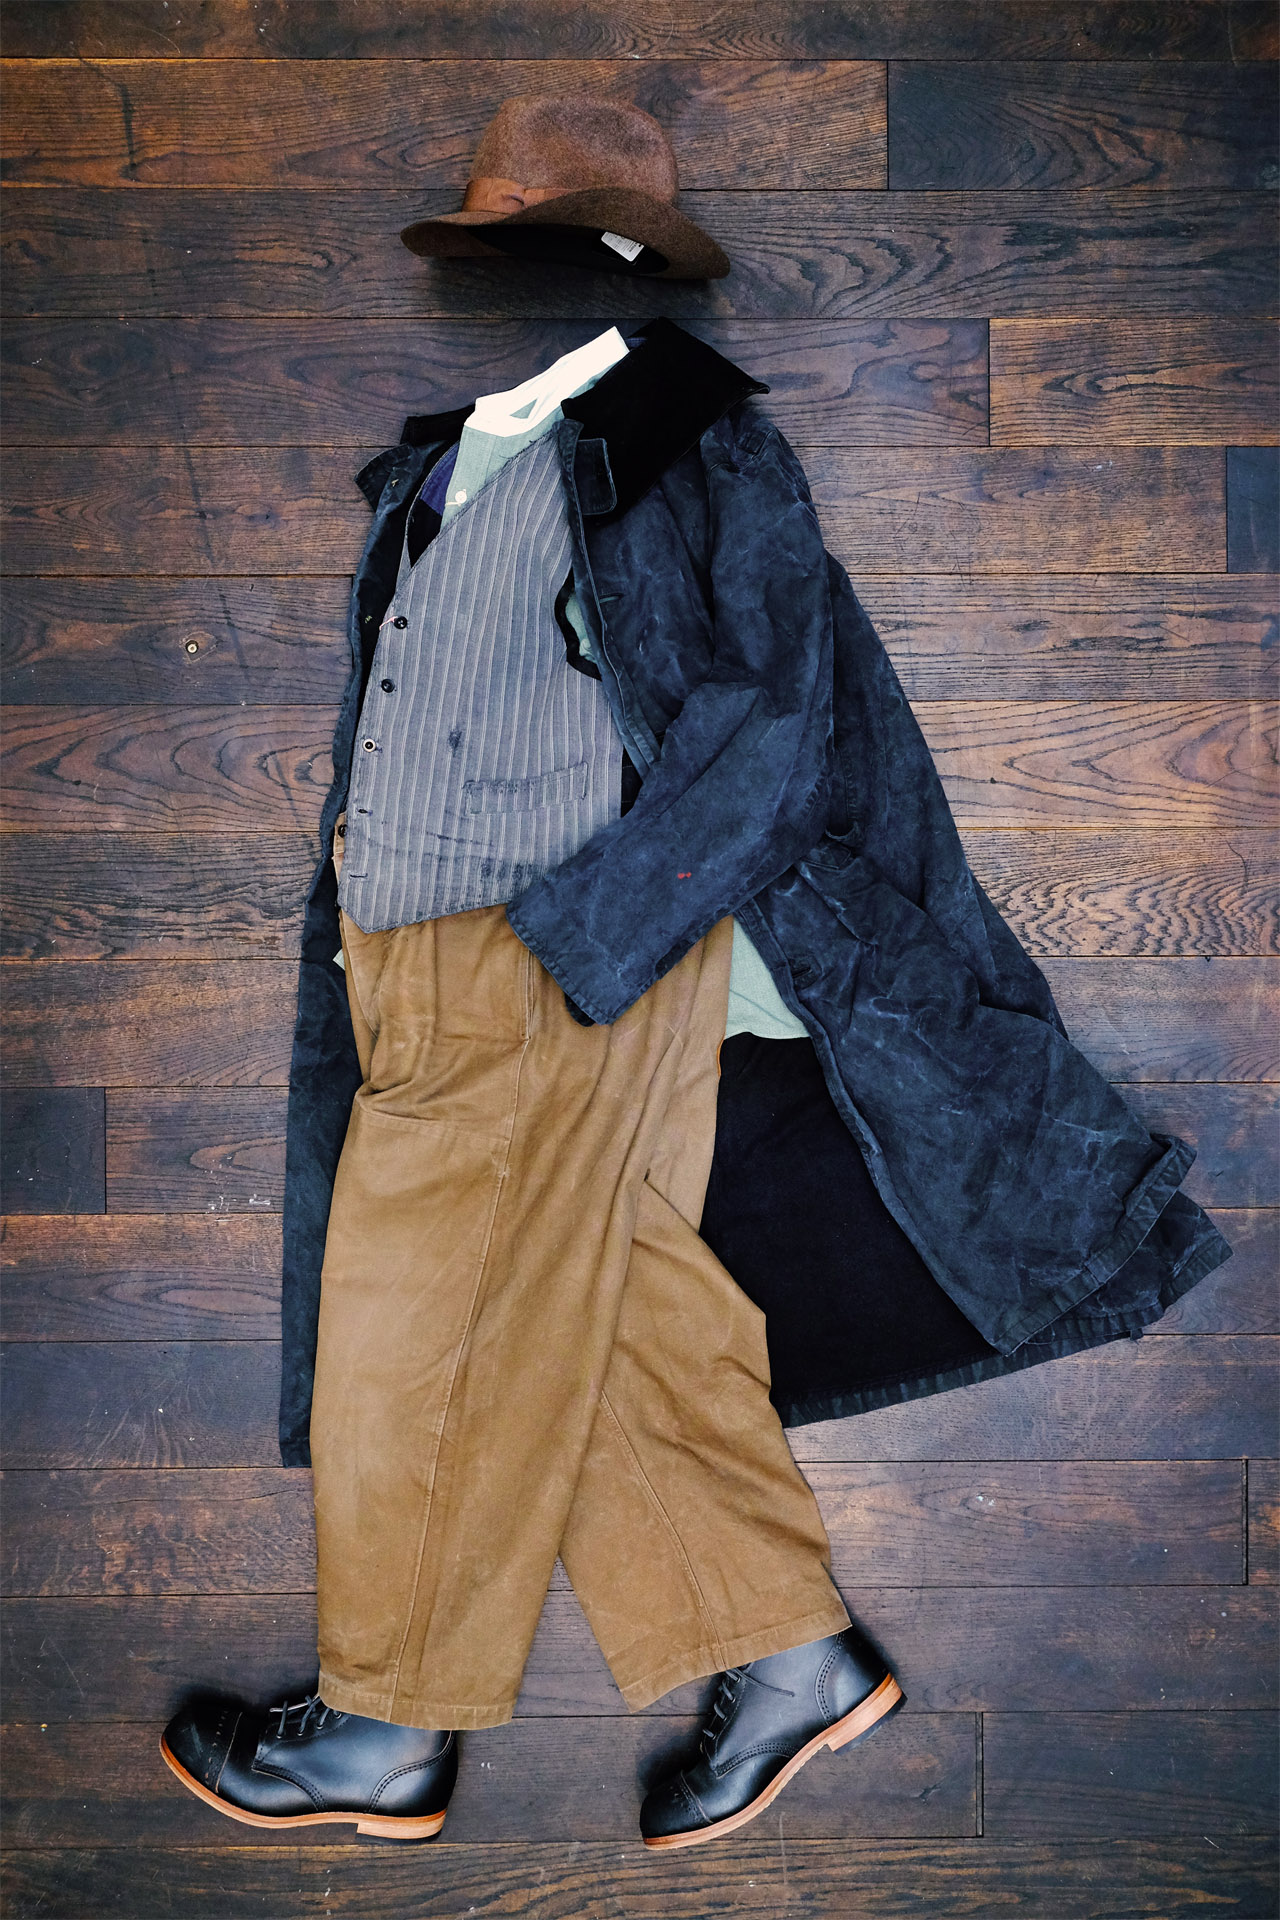 vintage-outfit-komplett-hose-mantel-weste-interbrigade-derbyboots-salvatorepiccolo-hut